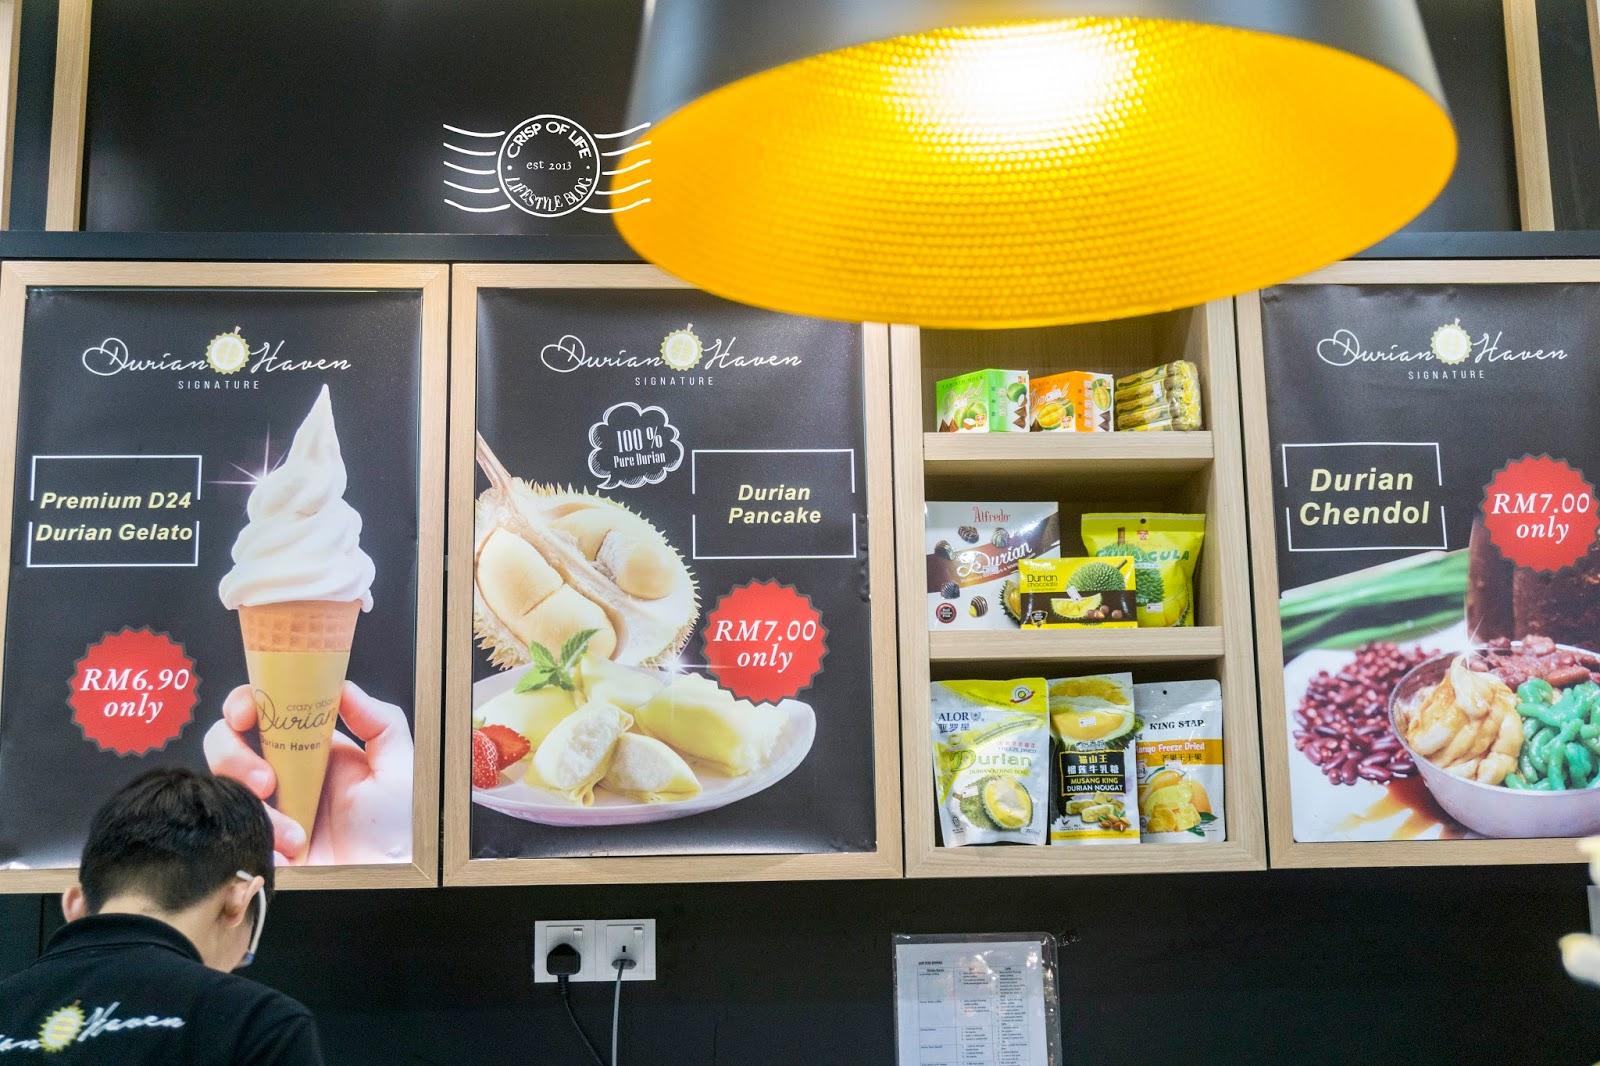 Durian Haven Dessert Queensbay Mall